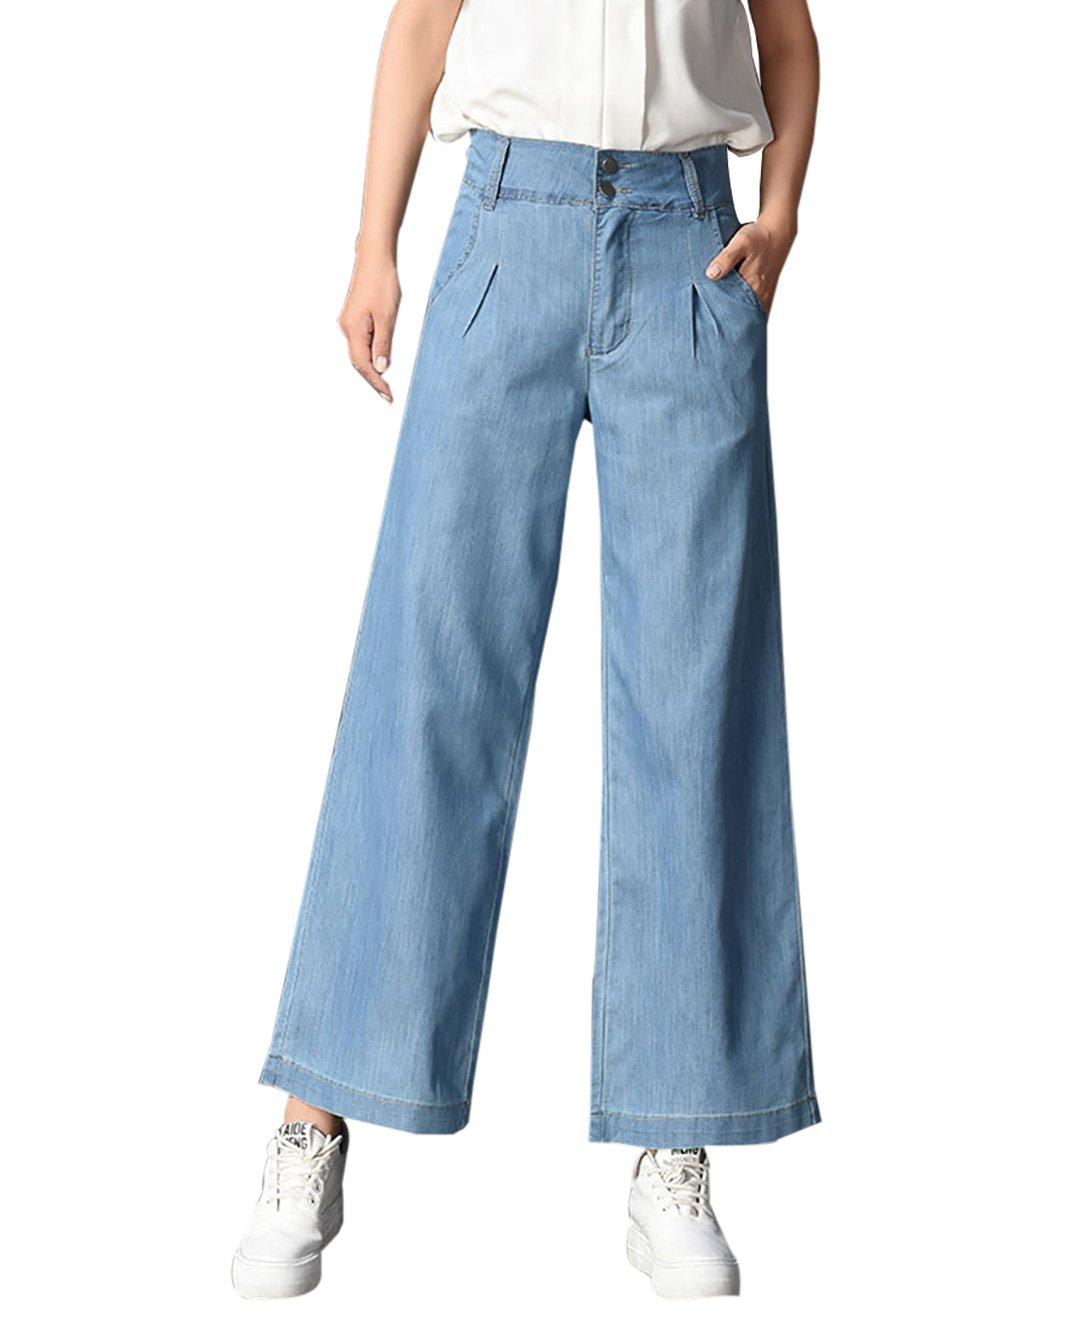 Yimoon Women's Summer Lightweight Tencel Denim Casual Wide Leg Palazzo Long Pant Loose Jeans (Light Blue, Small)